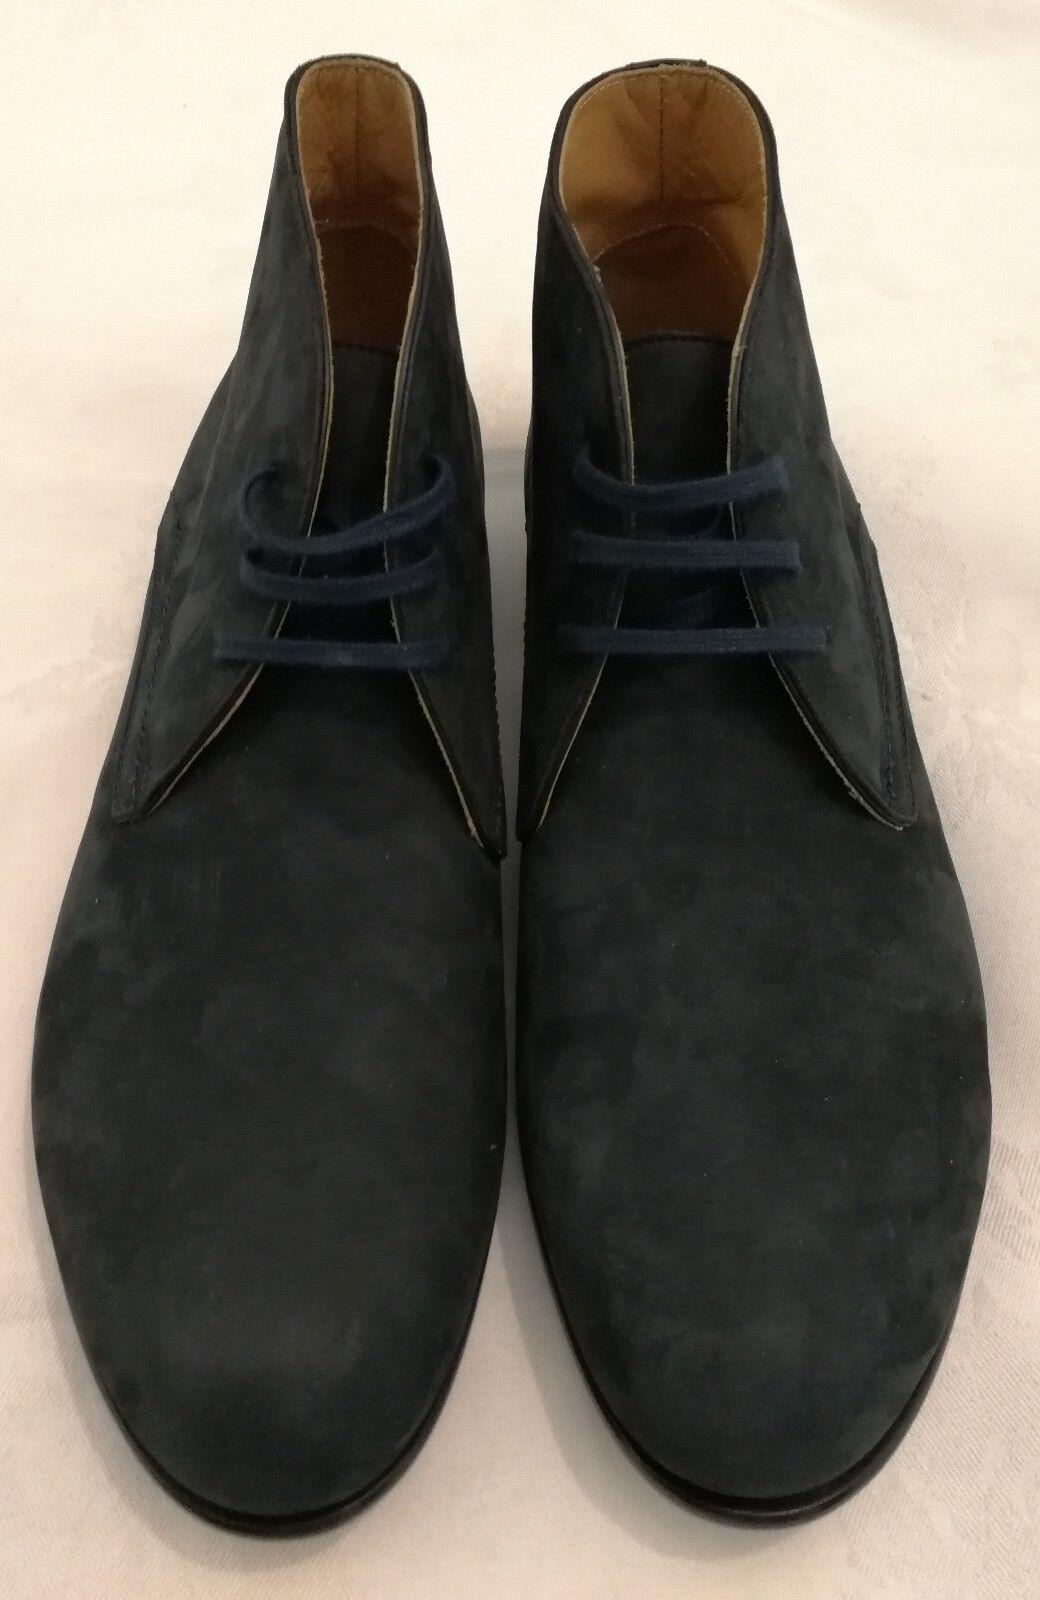 Cuero Nobuck Harrys Of London Griffin Postre Gamuza botas acordonadas F